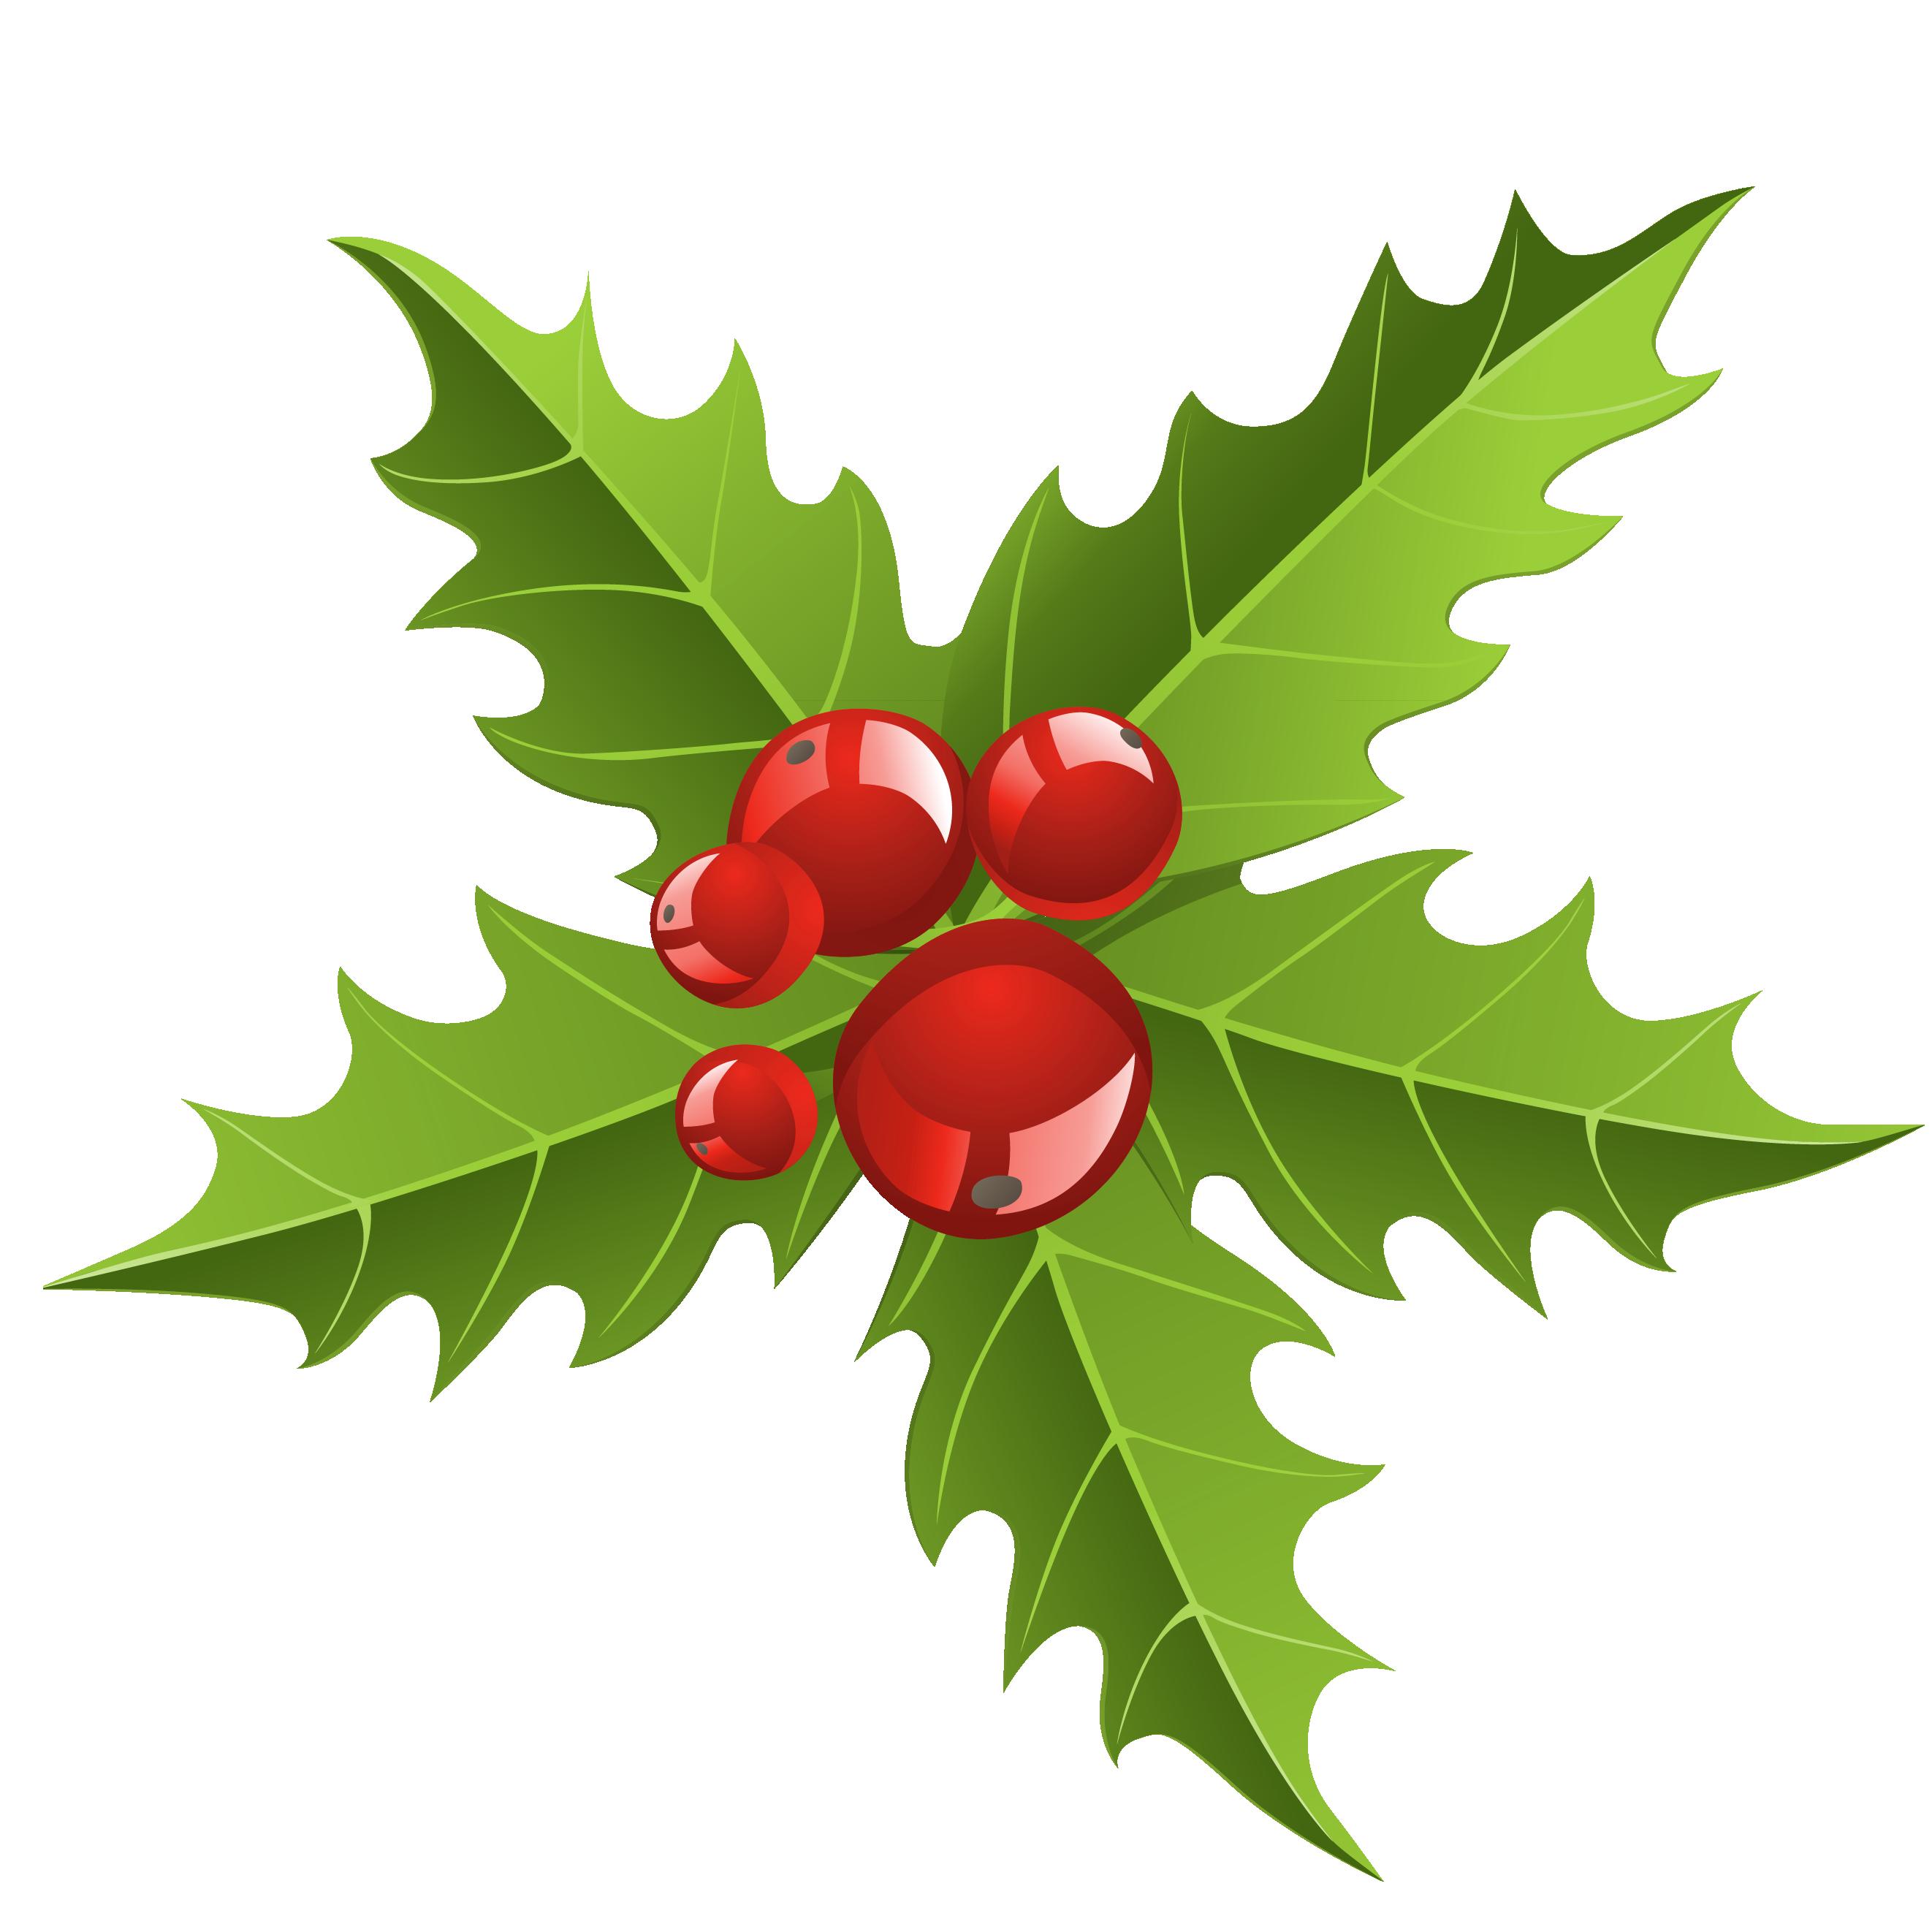 Clipart Mistletoe - Cliparts.co